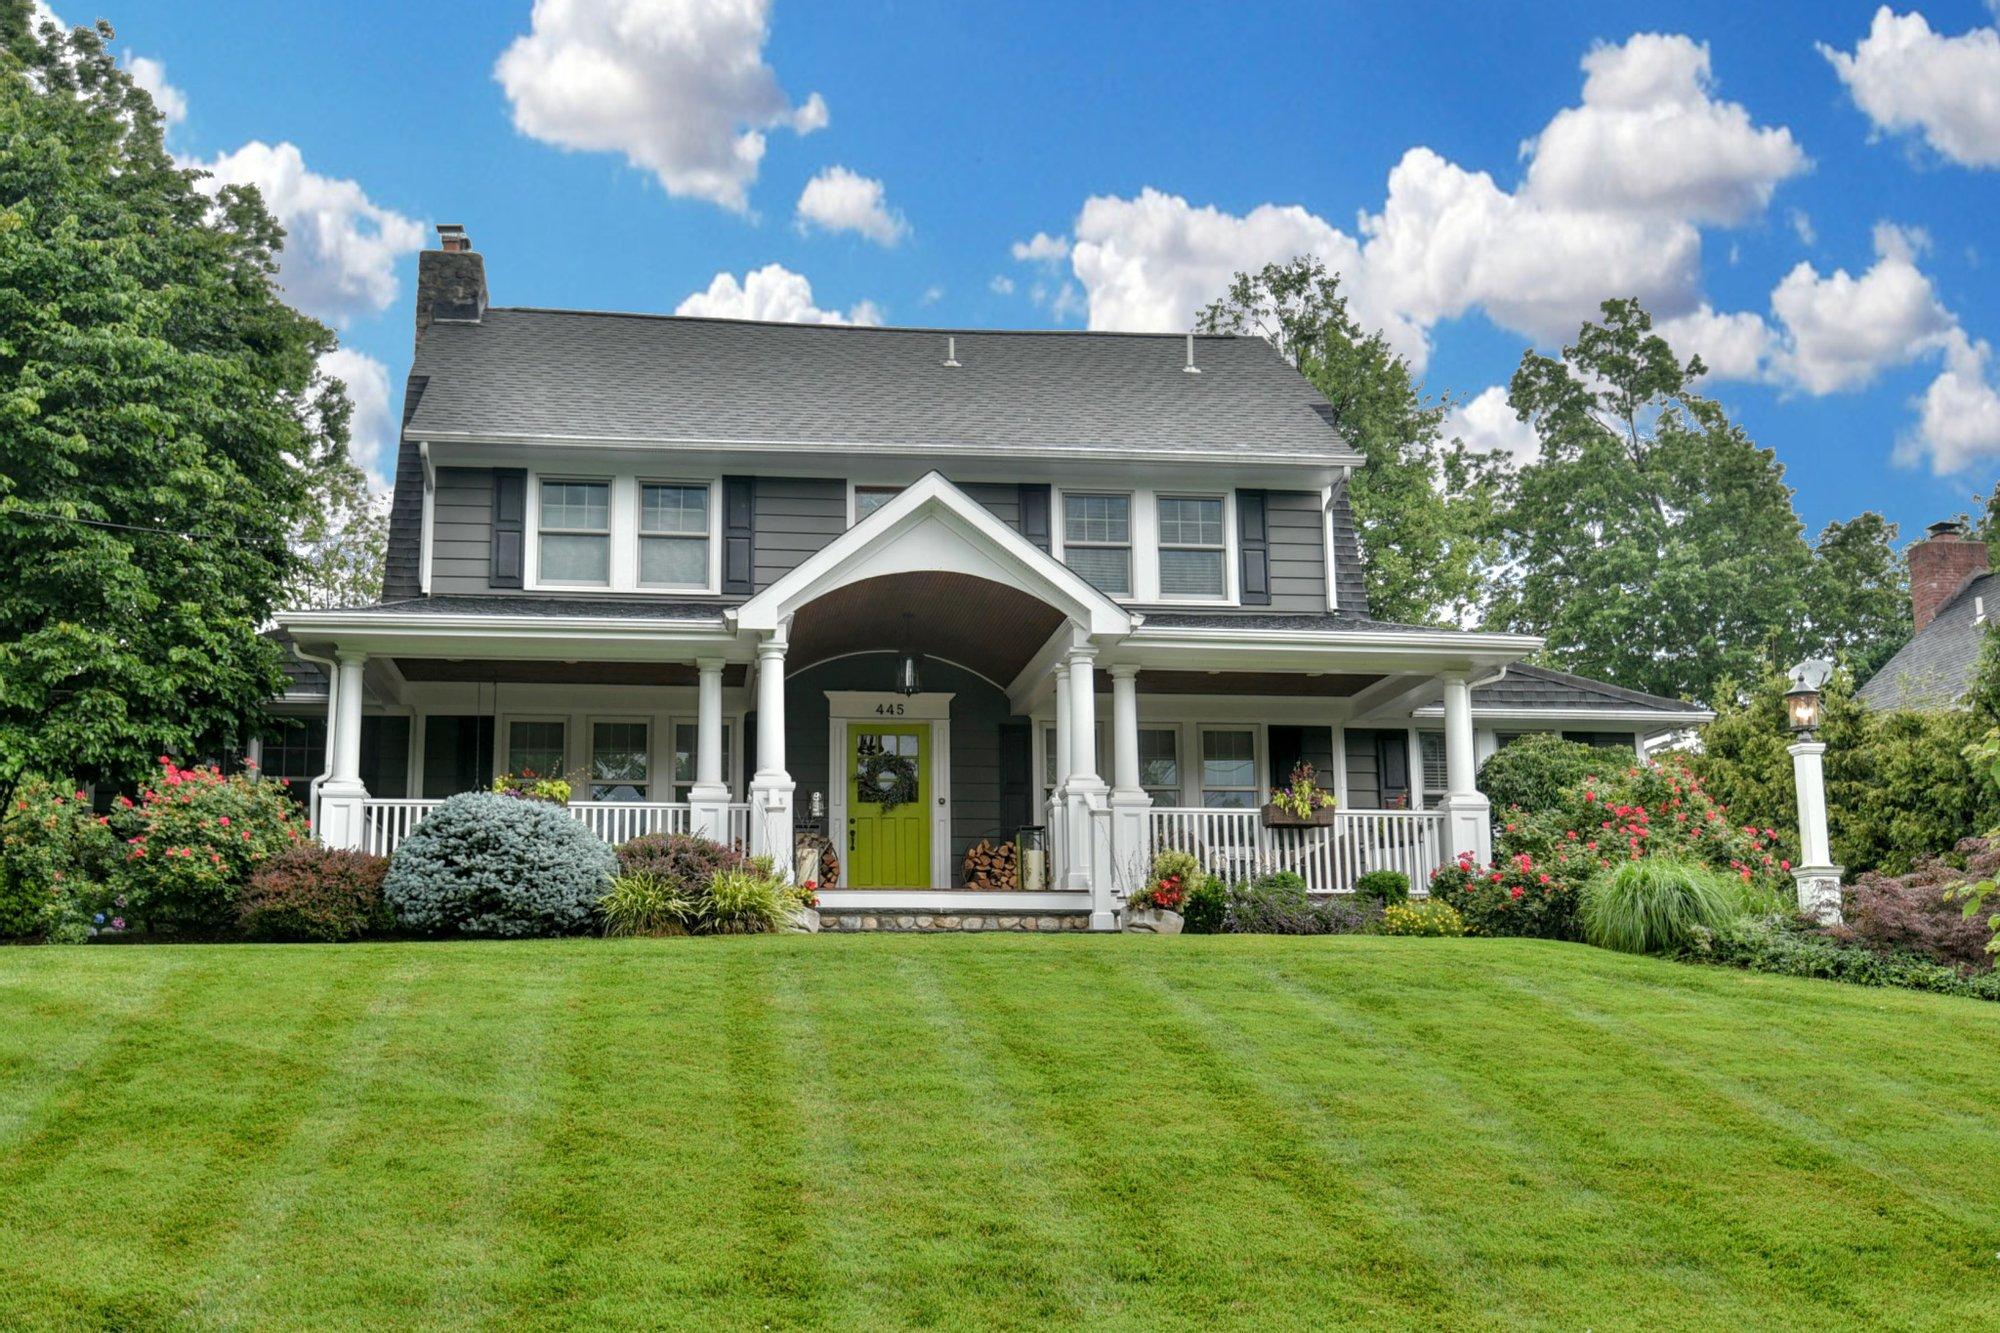 Casa a Ridgewood, New Jersey, Stati Uniti 1 - 11540051